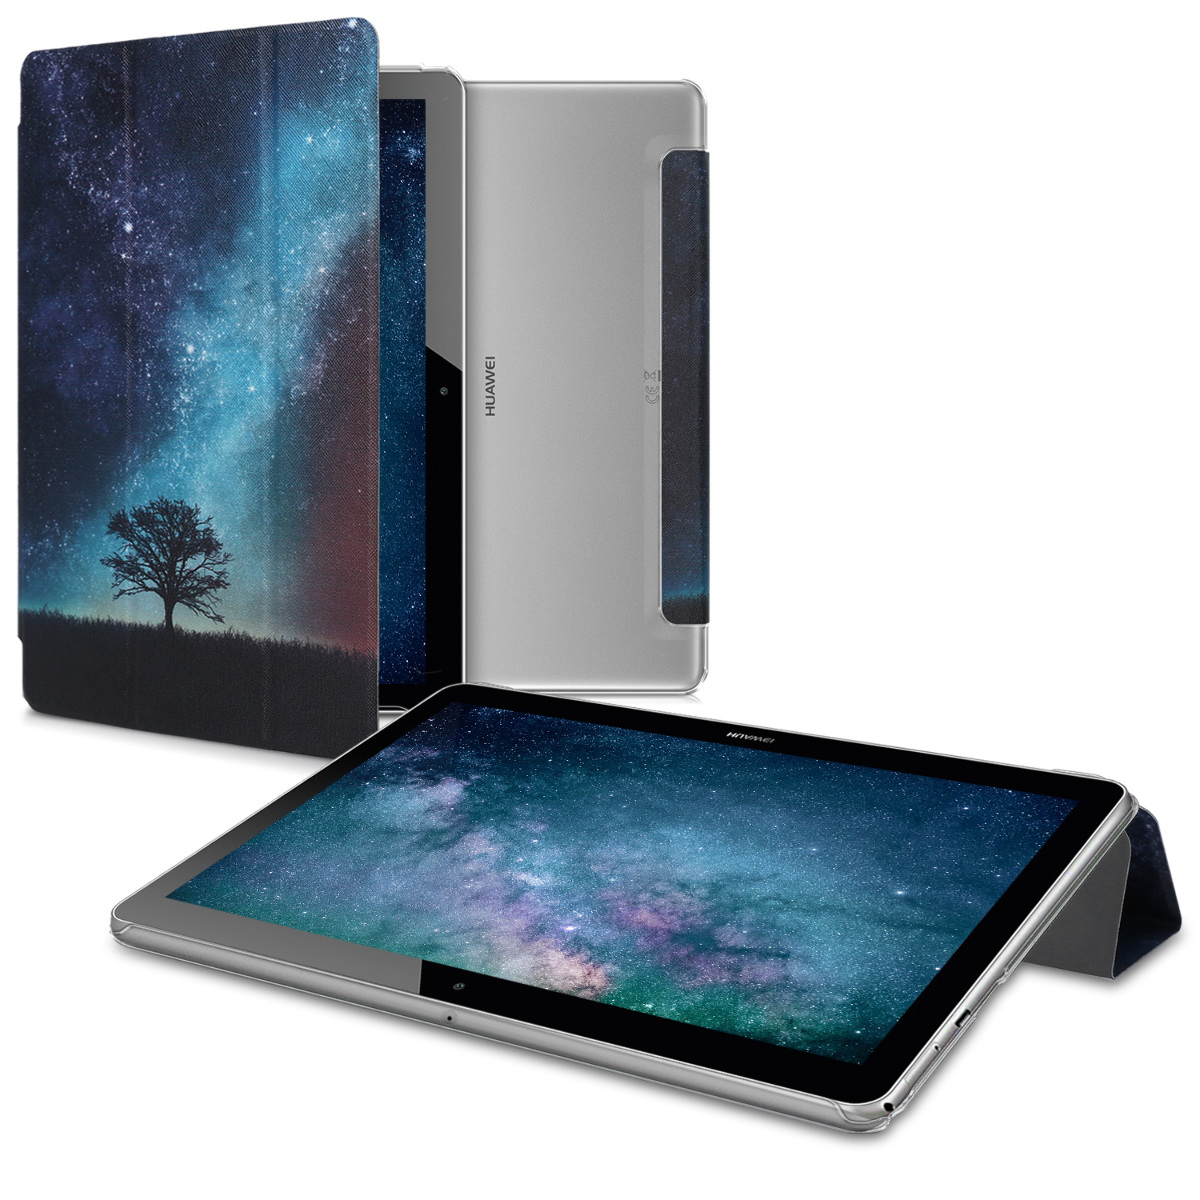 KW Θήκη Huawei MediaPad T3 10'' - Blue Galaxy Tree (44142.03)